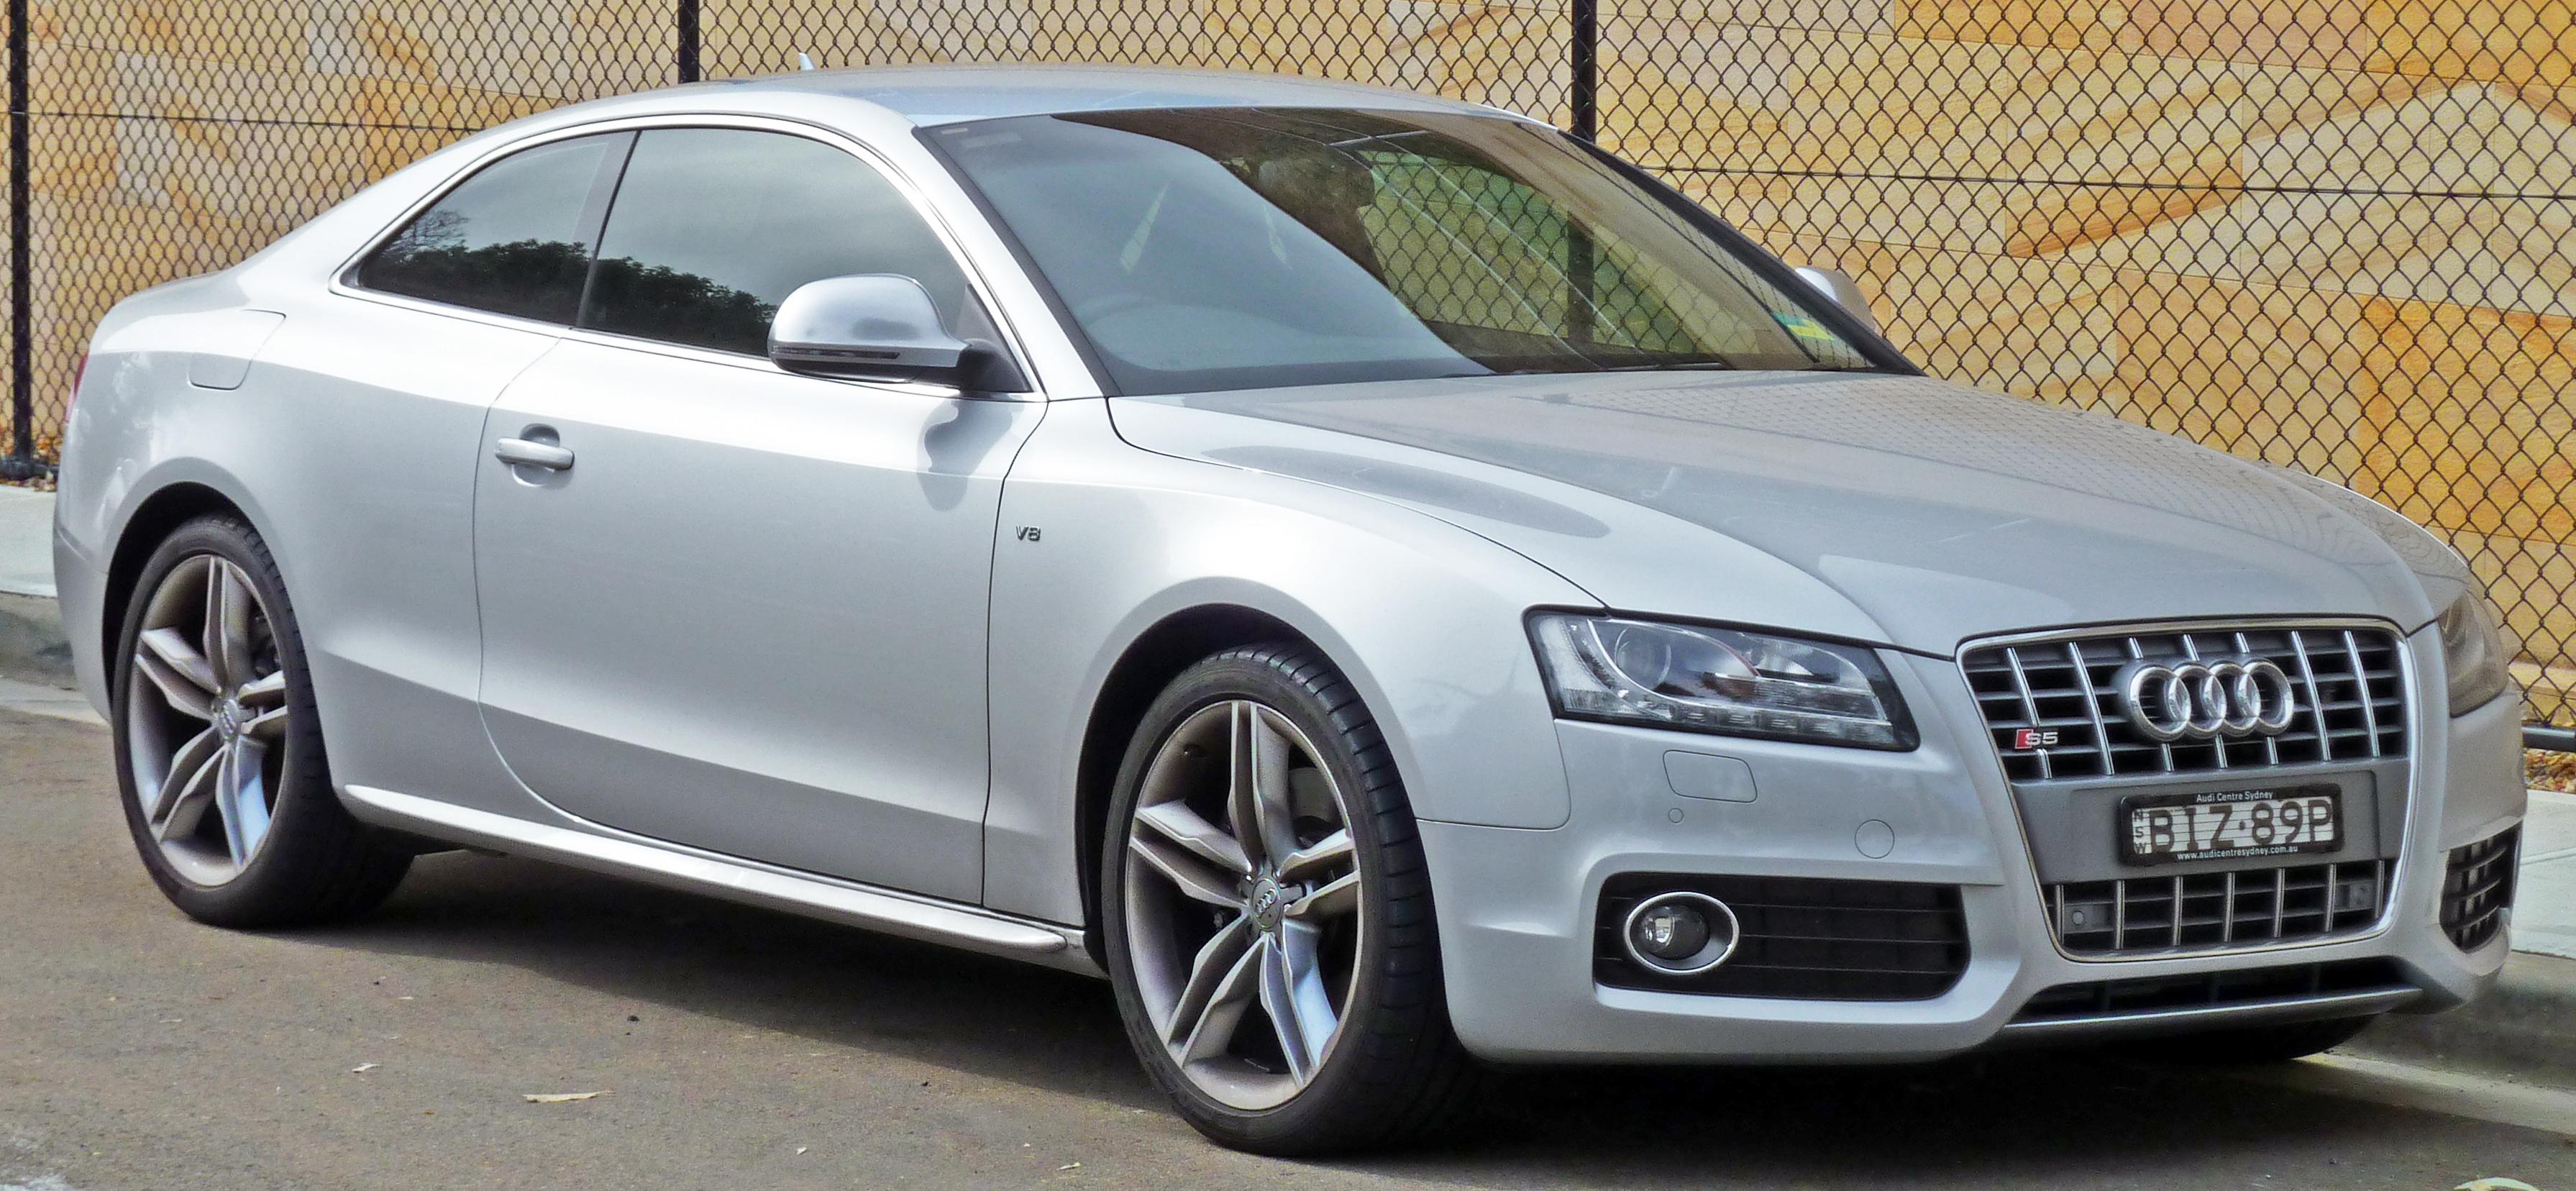 Audi RCEPS Steering Assist  RossTech Wiki